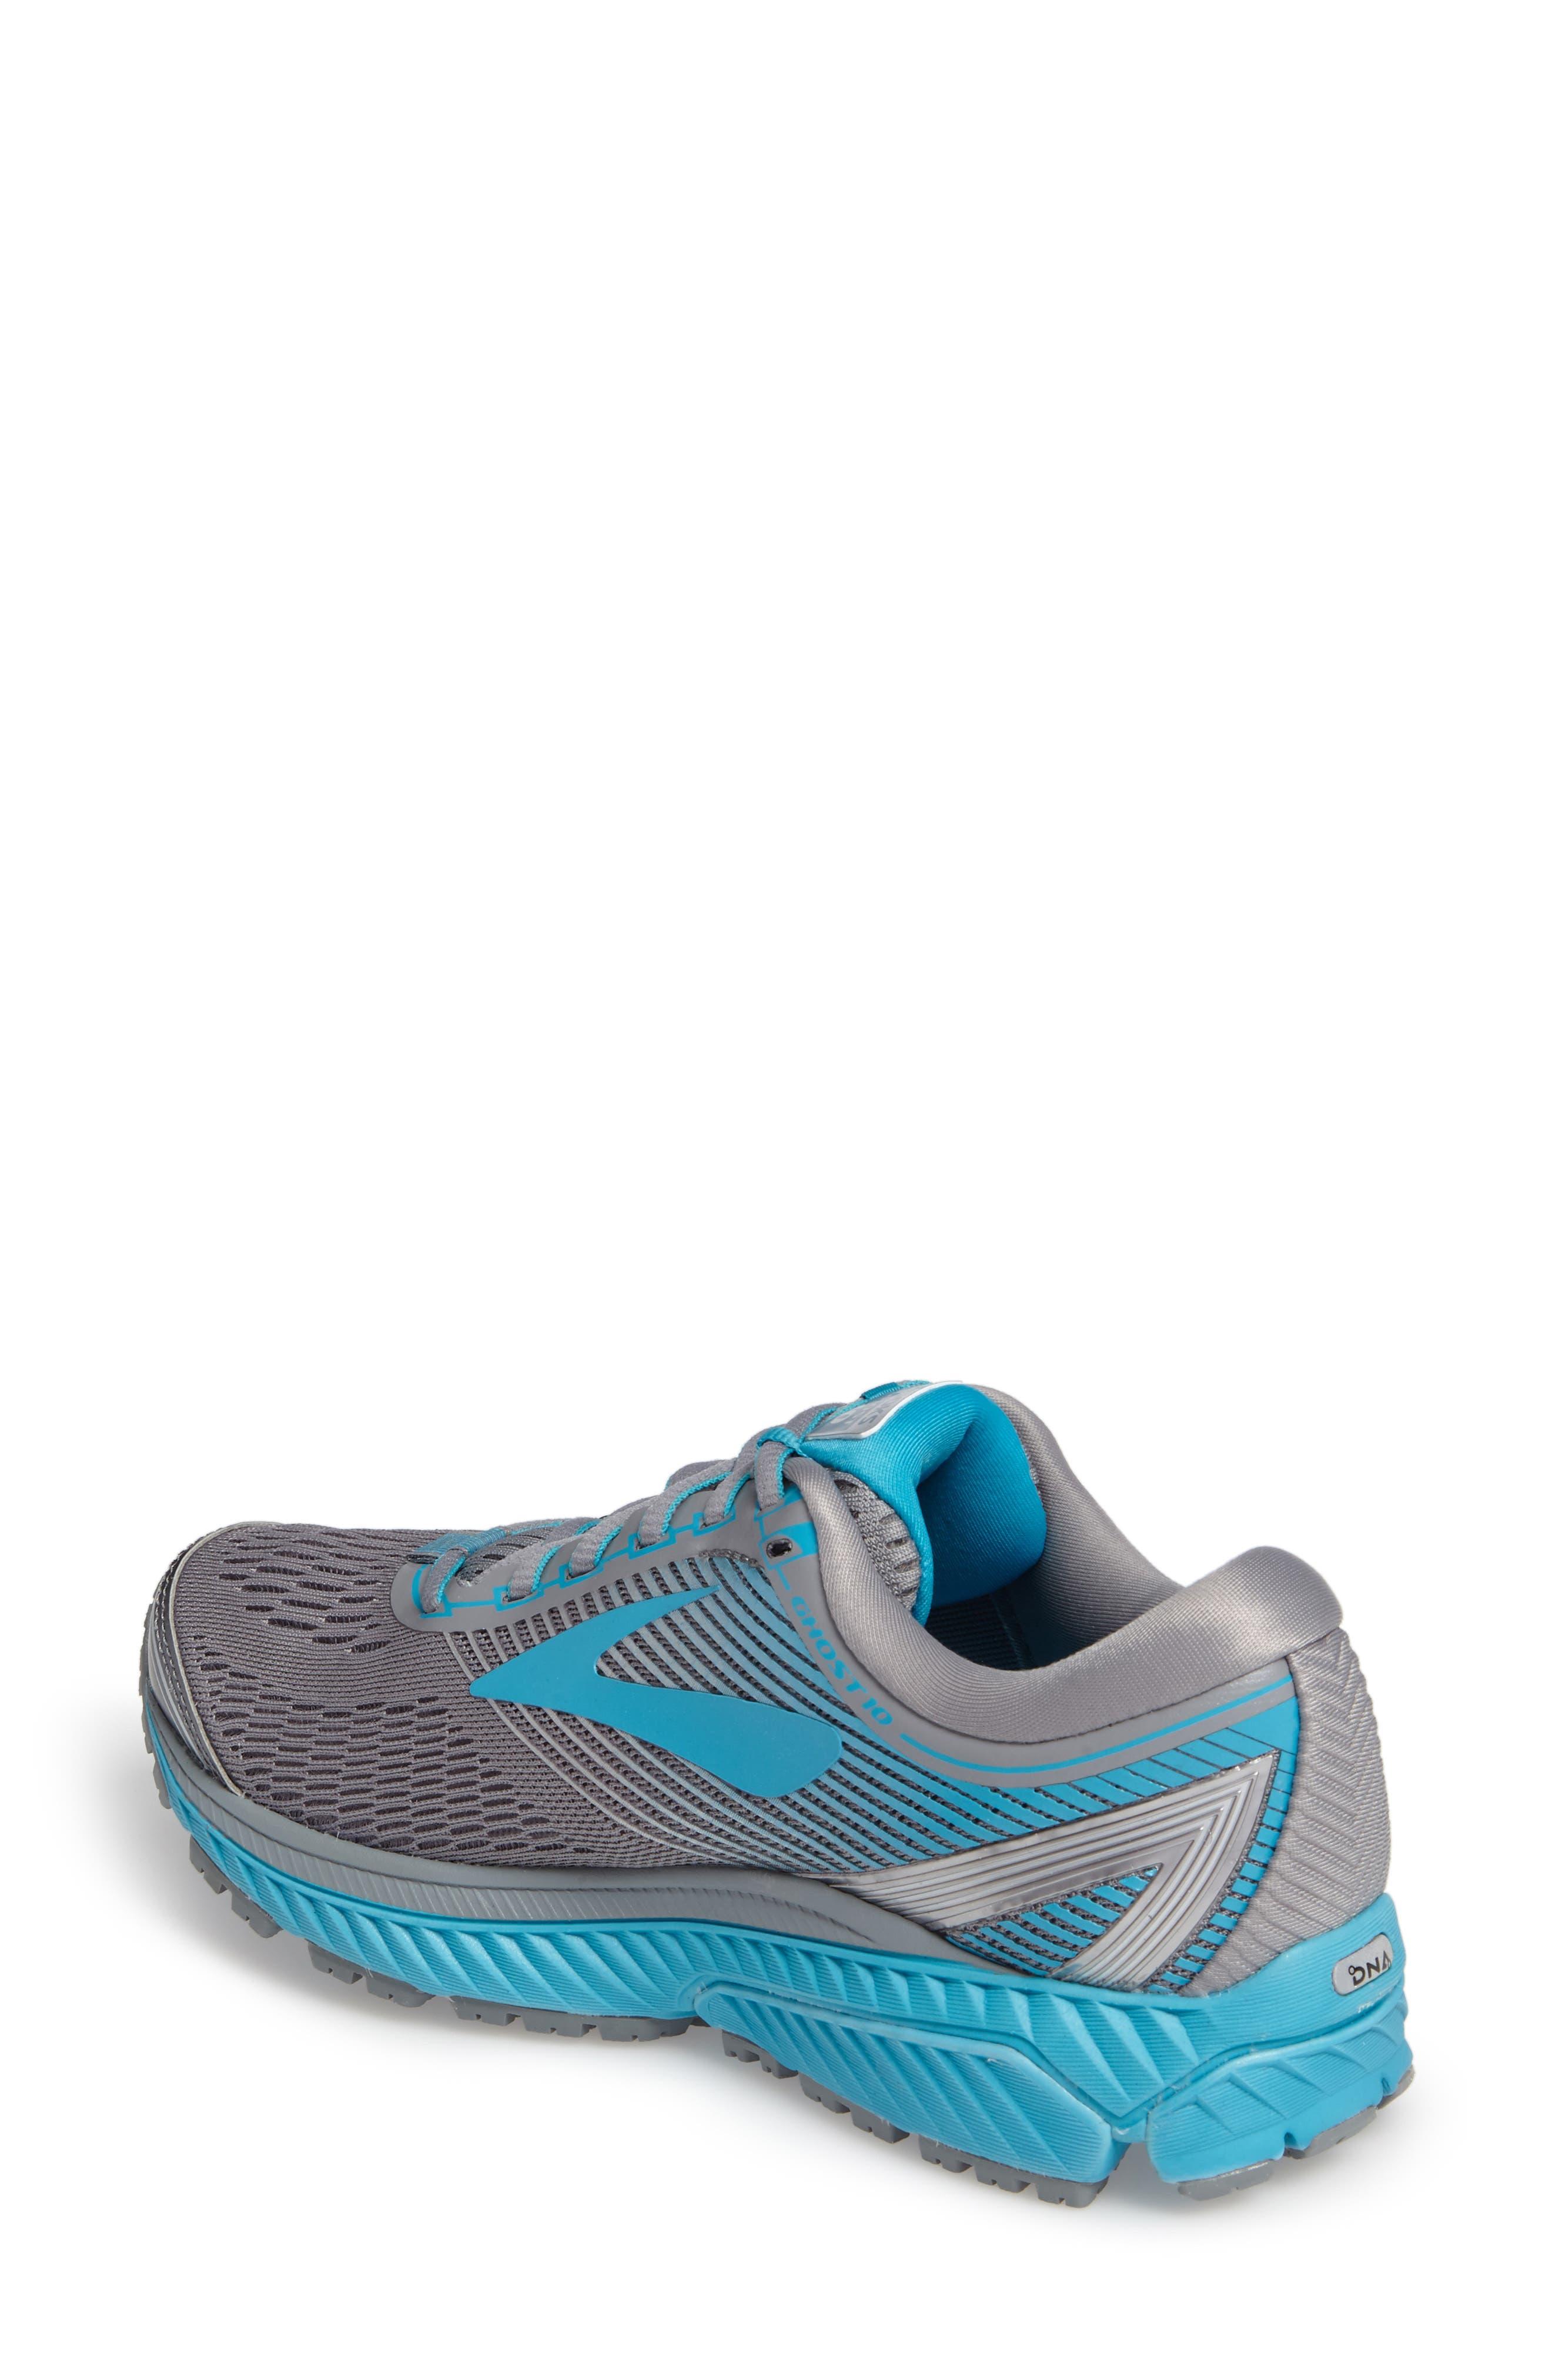 Ghost 10 Running Shoe,                             Alternate thumbnail 2, color,                             Primer Grey/ Teal/ Silver